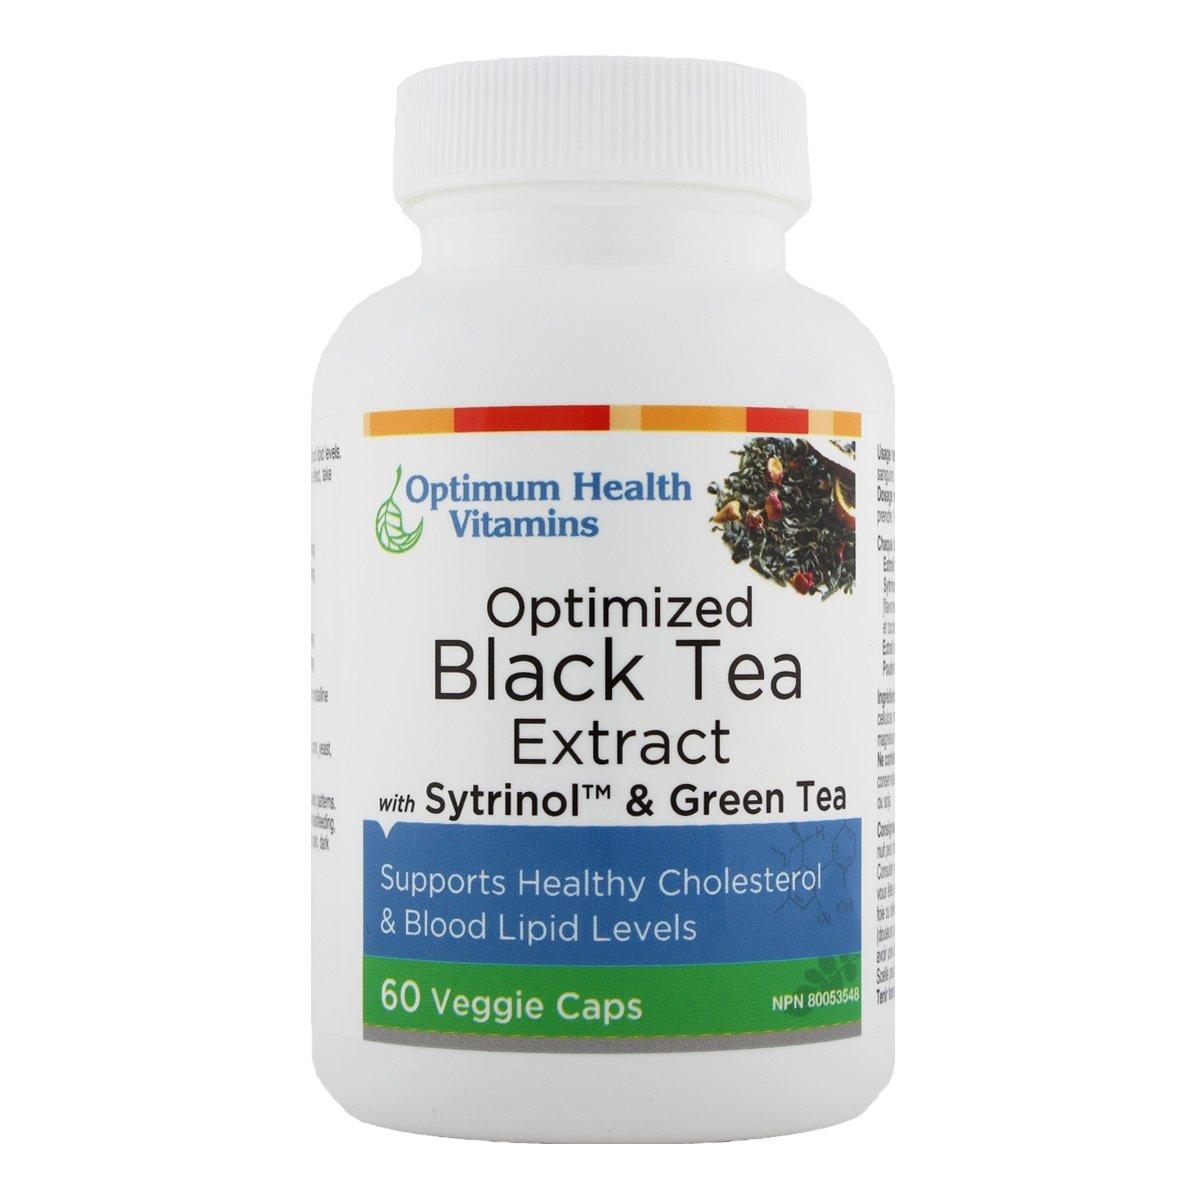 Optimized Black Tea Extract